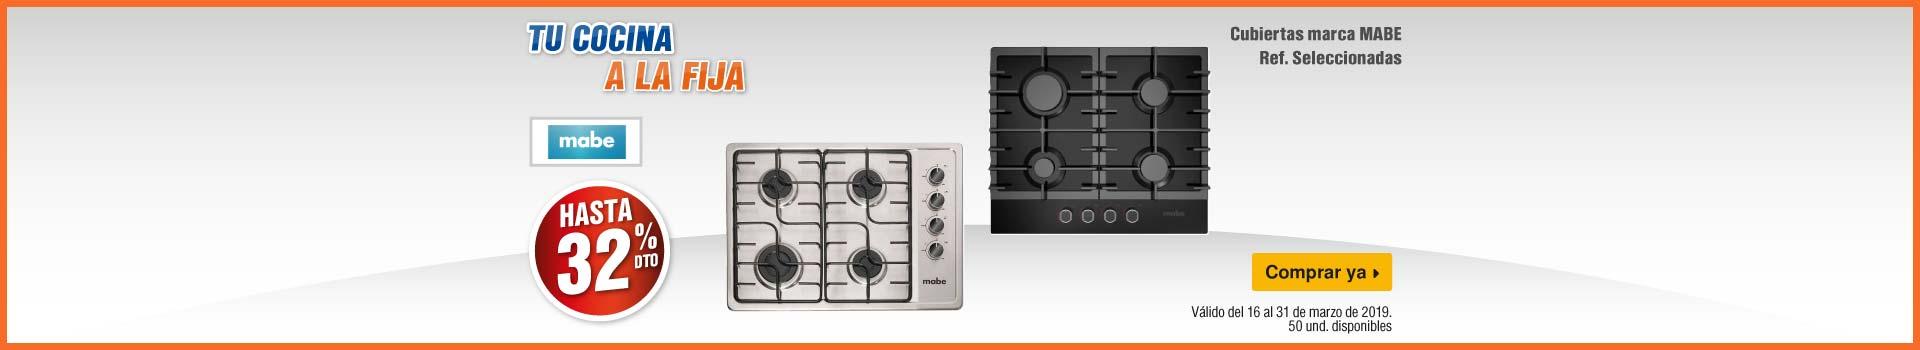 AK-KT-mayores-3-ELECT-BCAT-cocina-mabe-160319-2